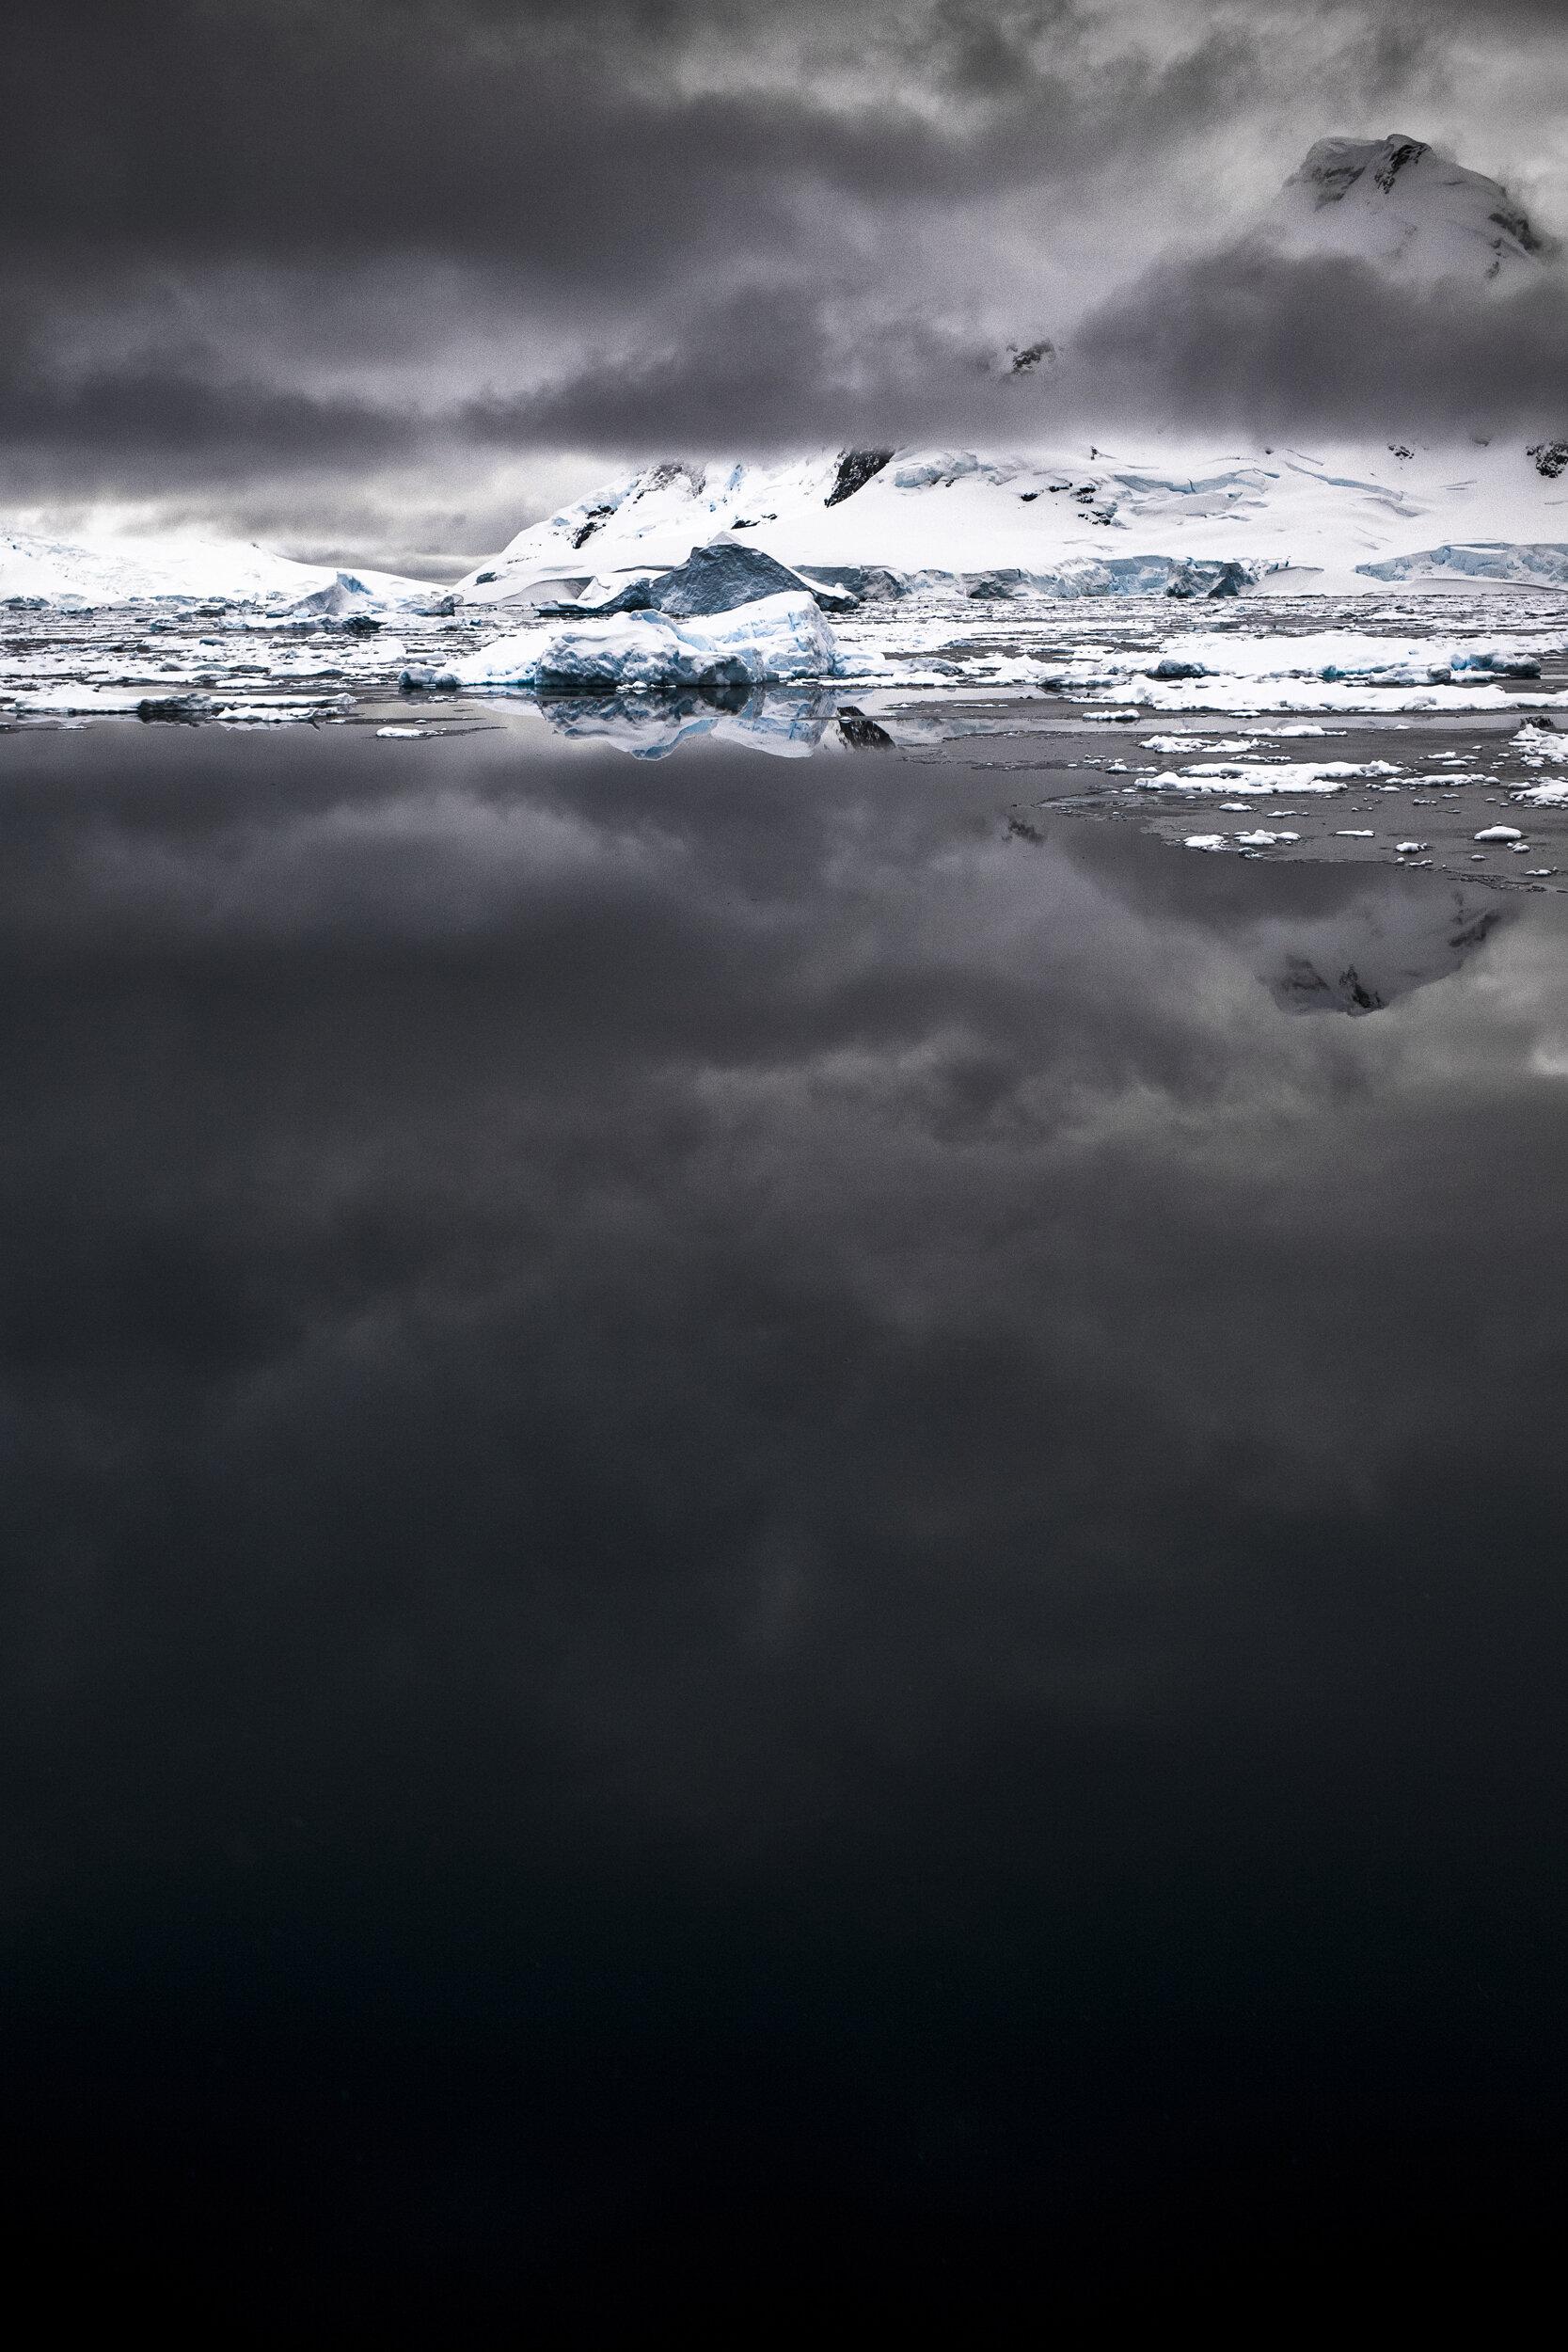 manuel_uebler_antarctica_twilight_007.jpg